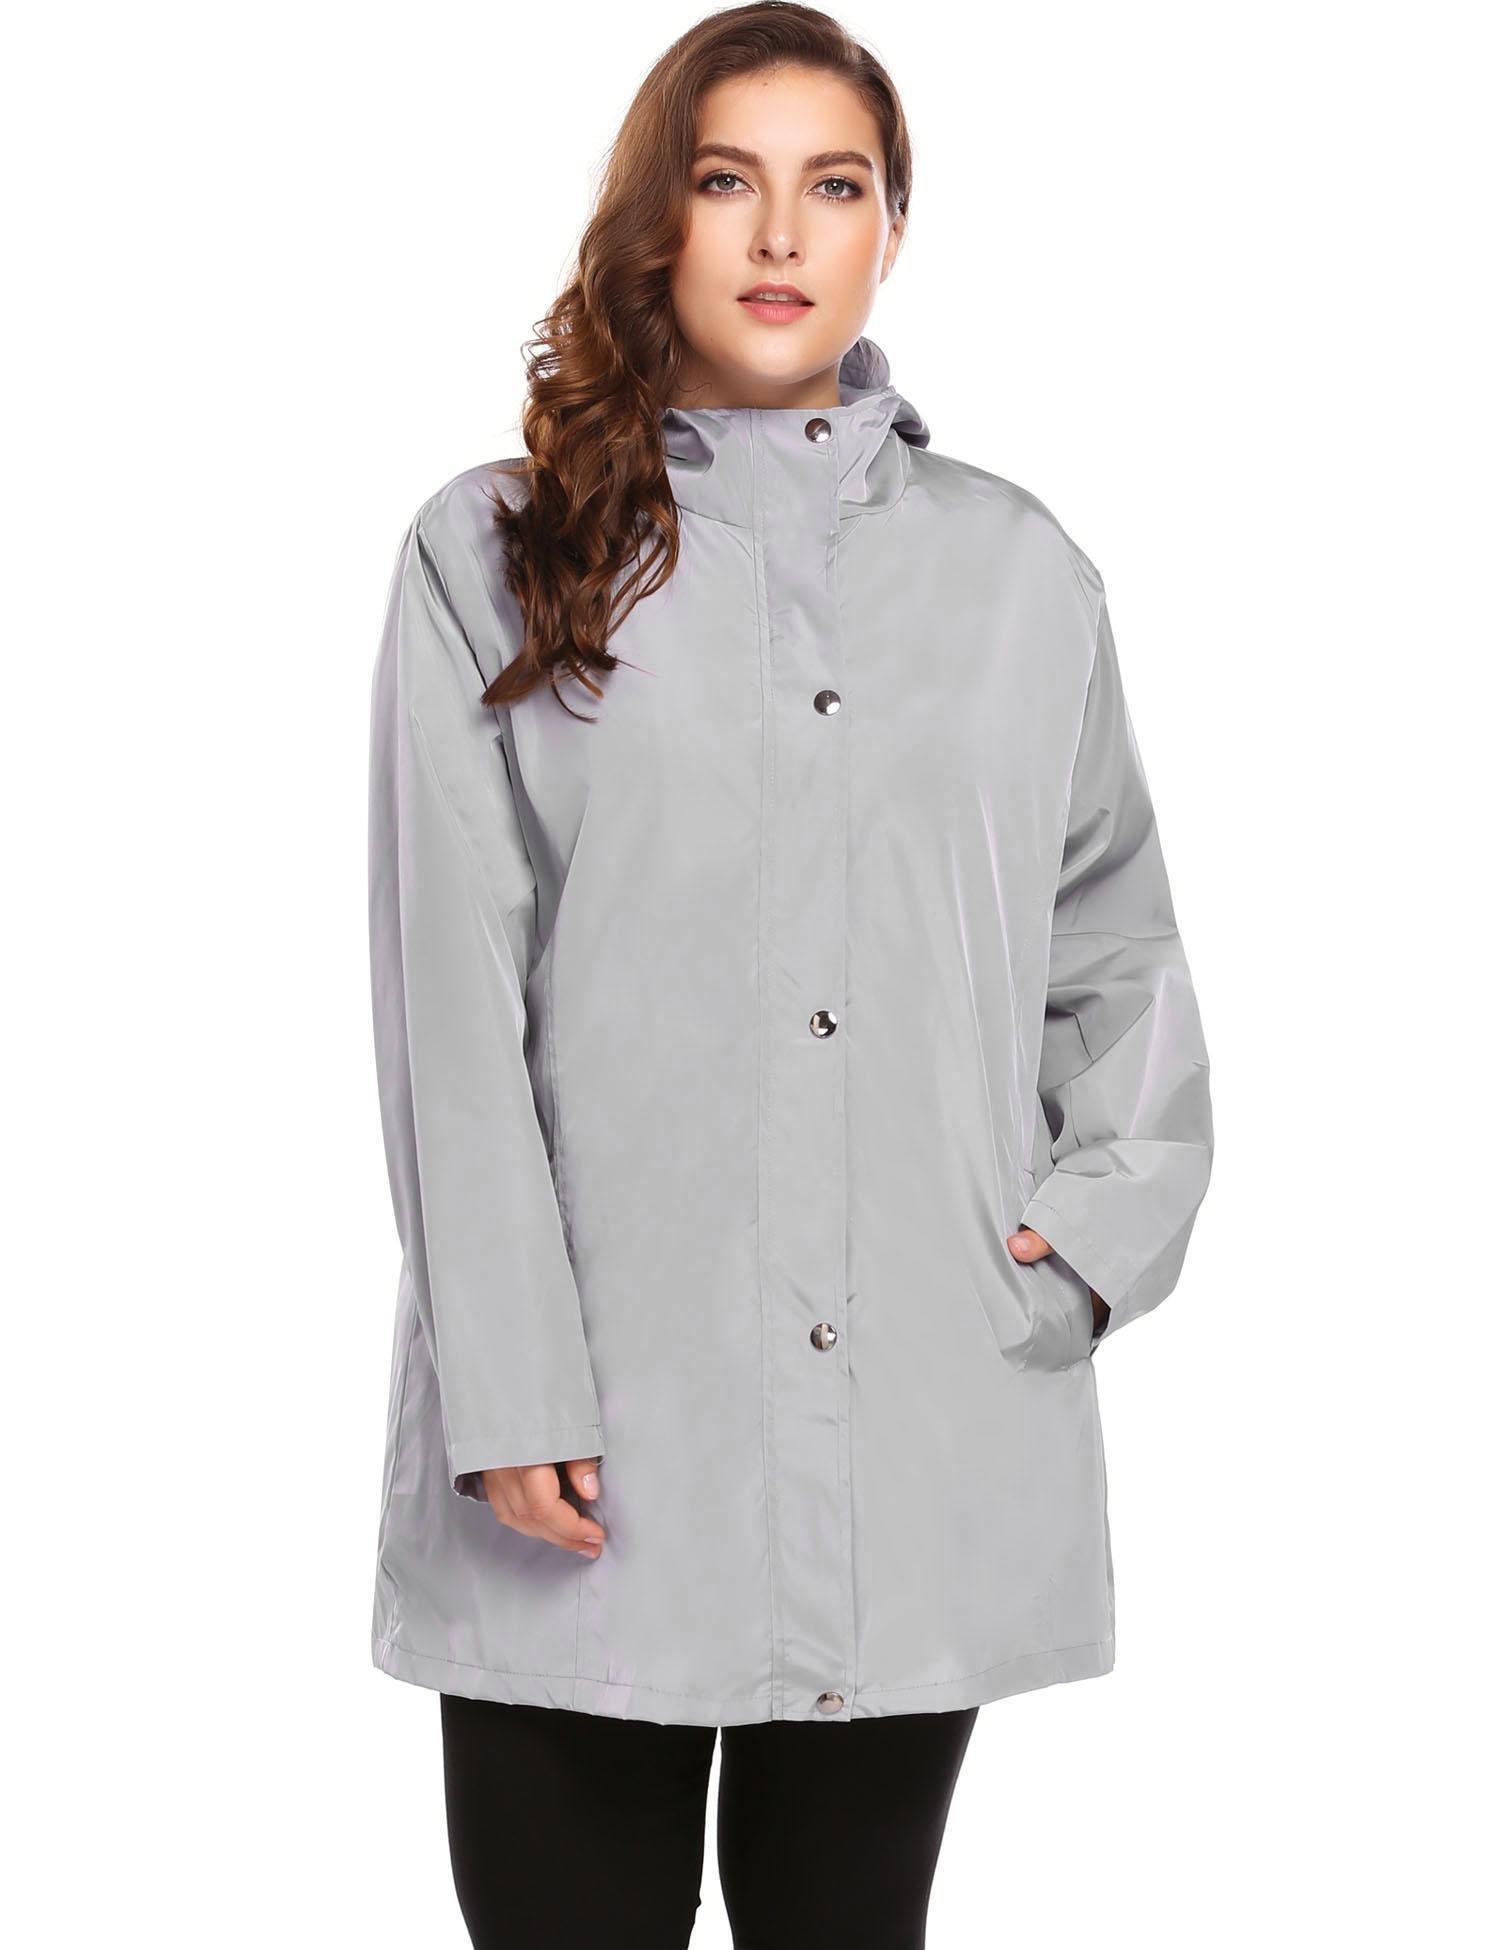 IN'VOLAND Womens Plus Size Lightweight Windbreaker Raincoat Travel Rain Jacket Windproof Hiking Portable Waterproof Coat